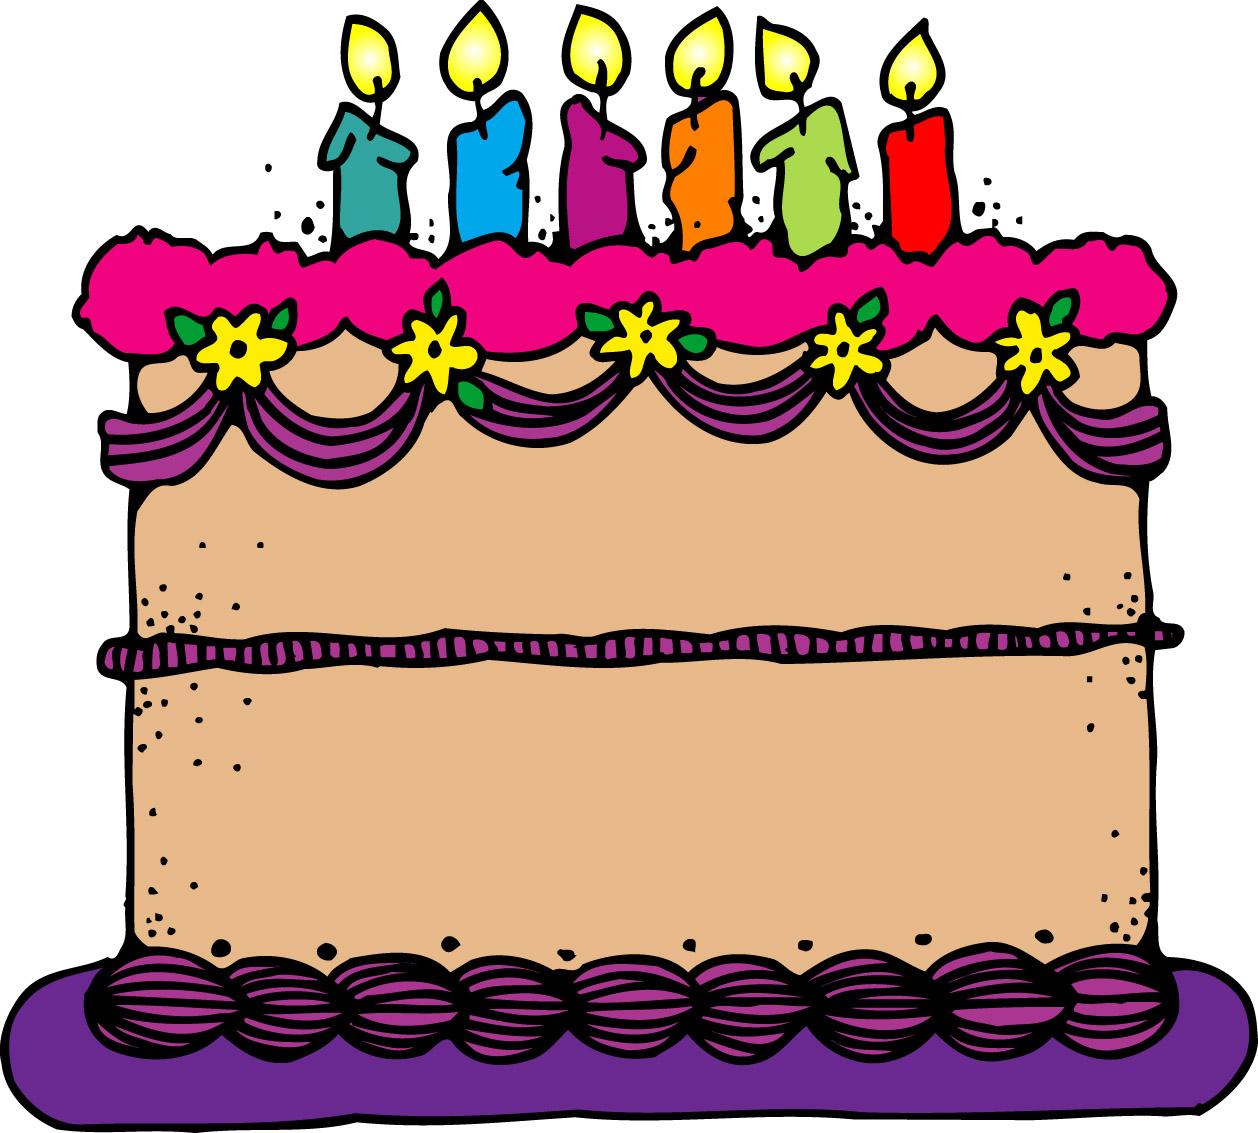 Birthday Cake Clip Art Free .-Birthday cake clip art free .-10